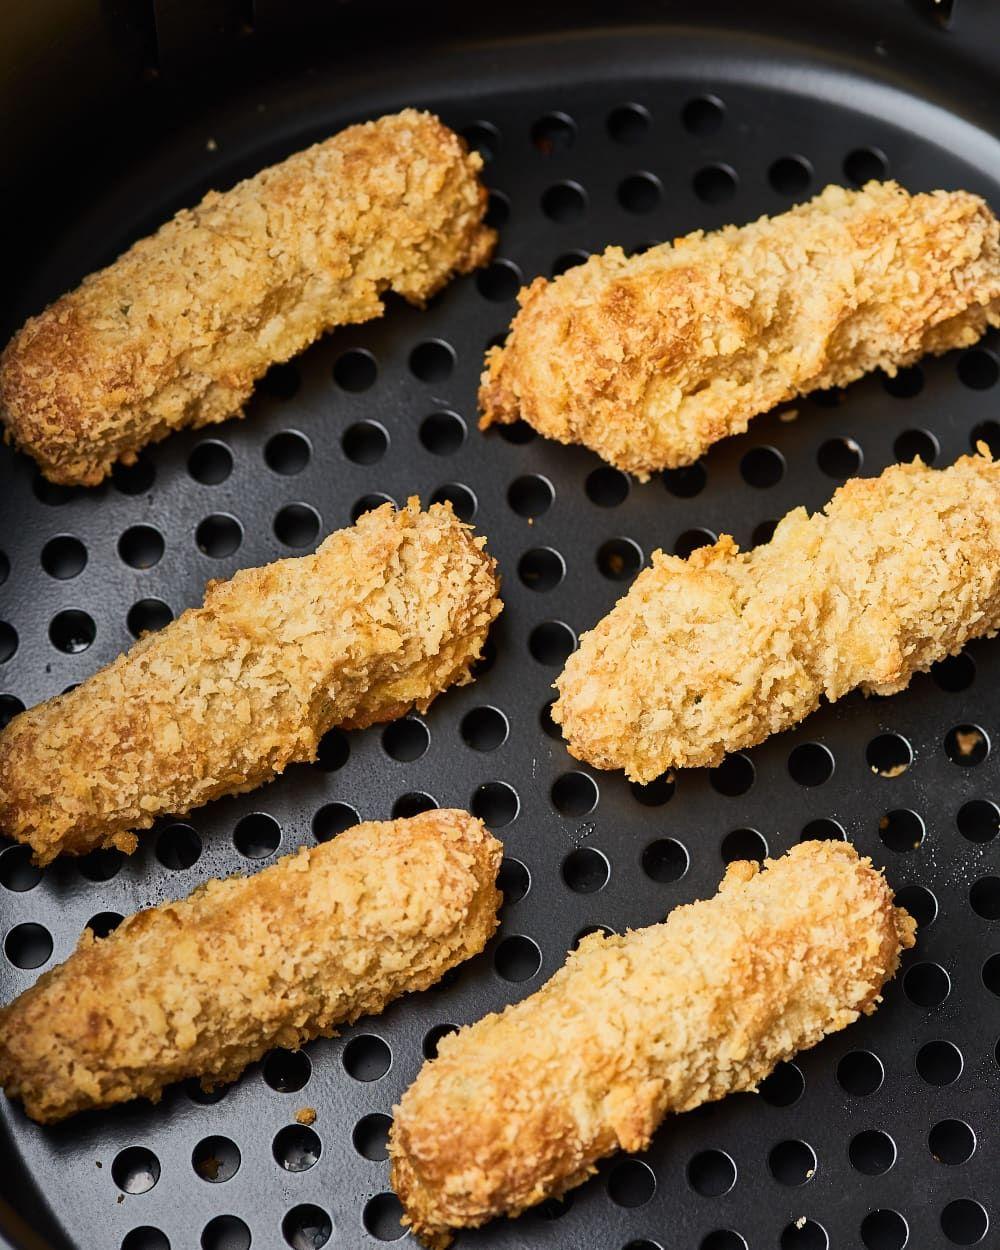 Air fryer mozzarella sticks recipe mozzarella sticks